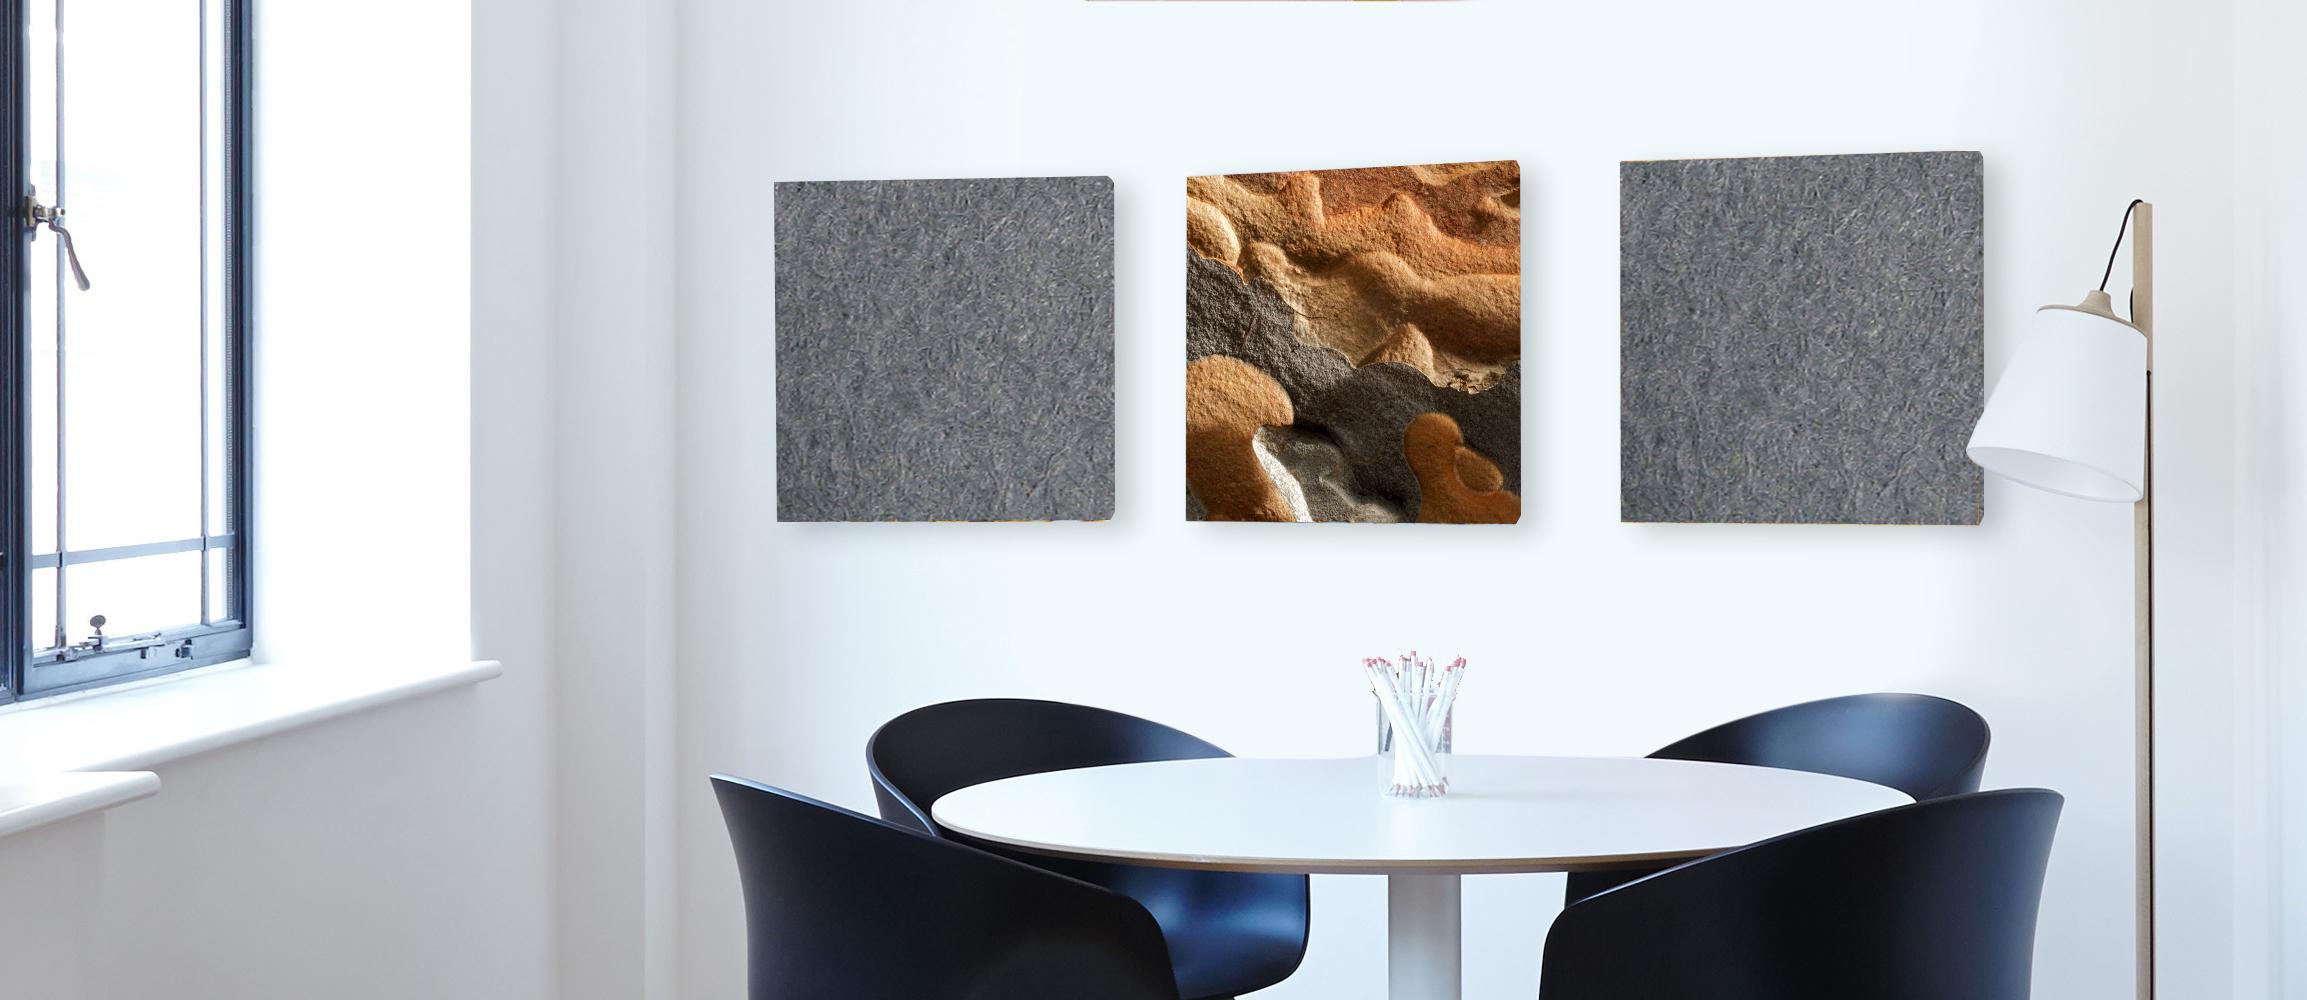 canvas-mockup-office.jpg